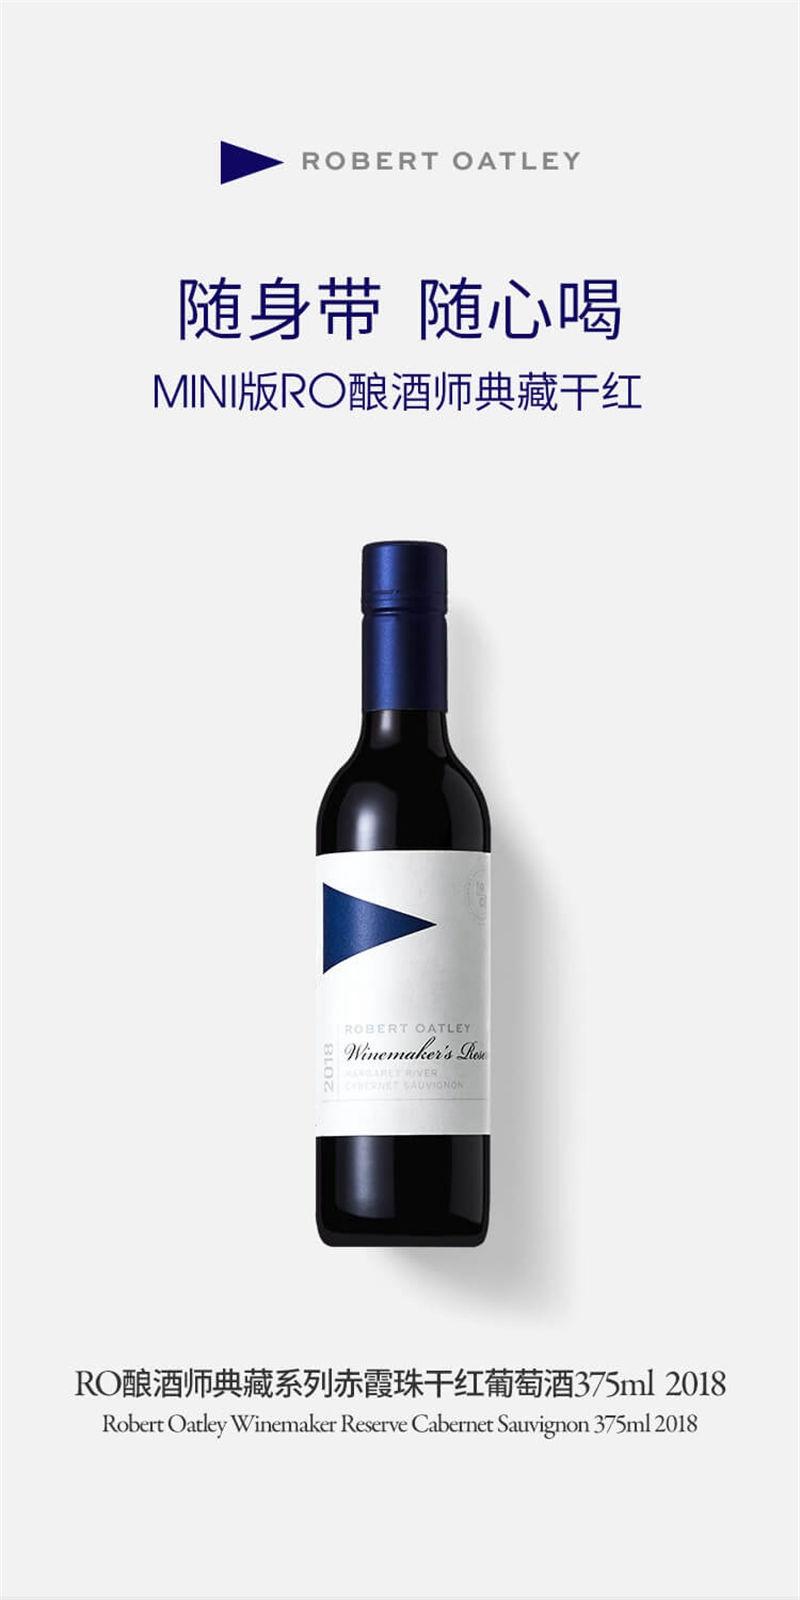 Robert Oatley mini酿酒师典藏赤霞珠干红葡萄酒375ml*6瓶 特点